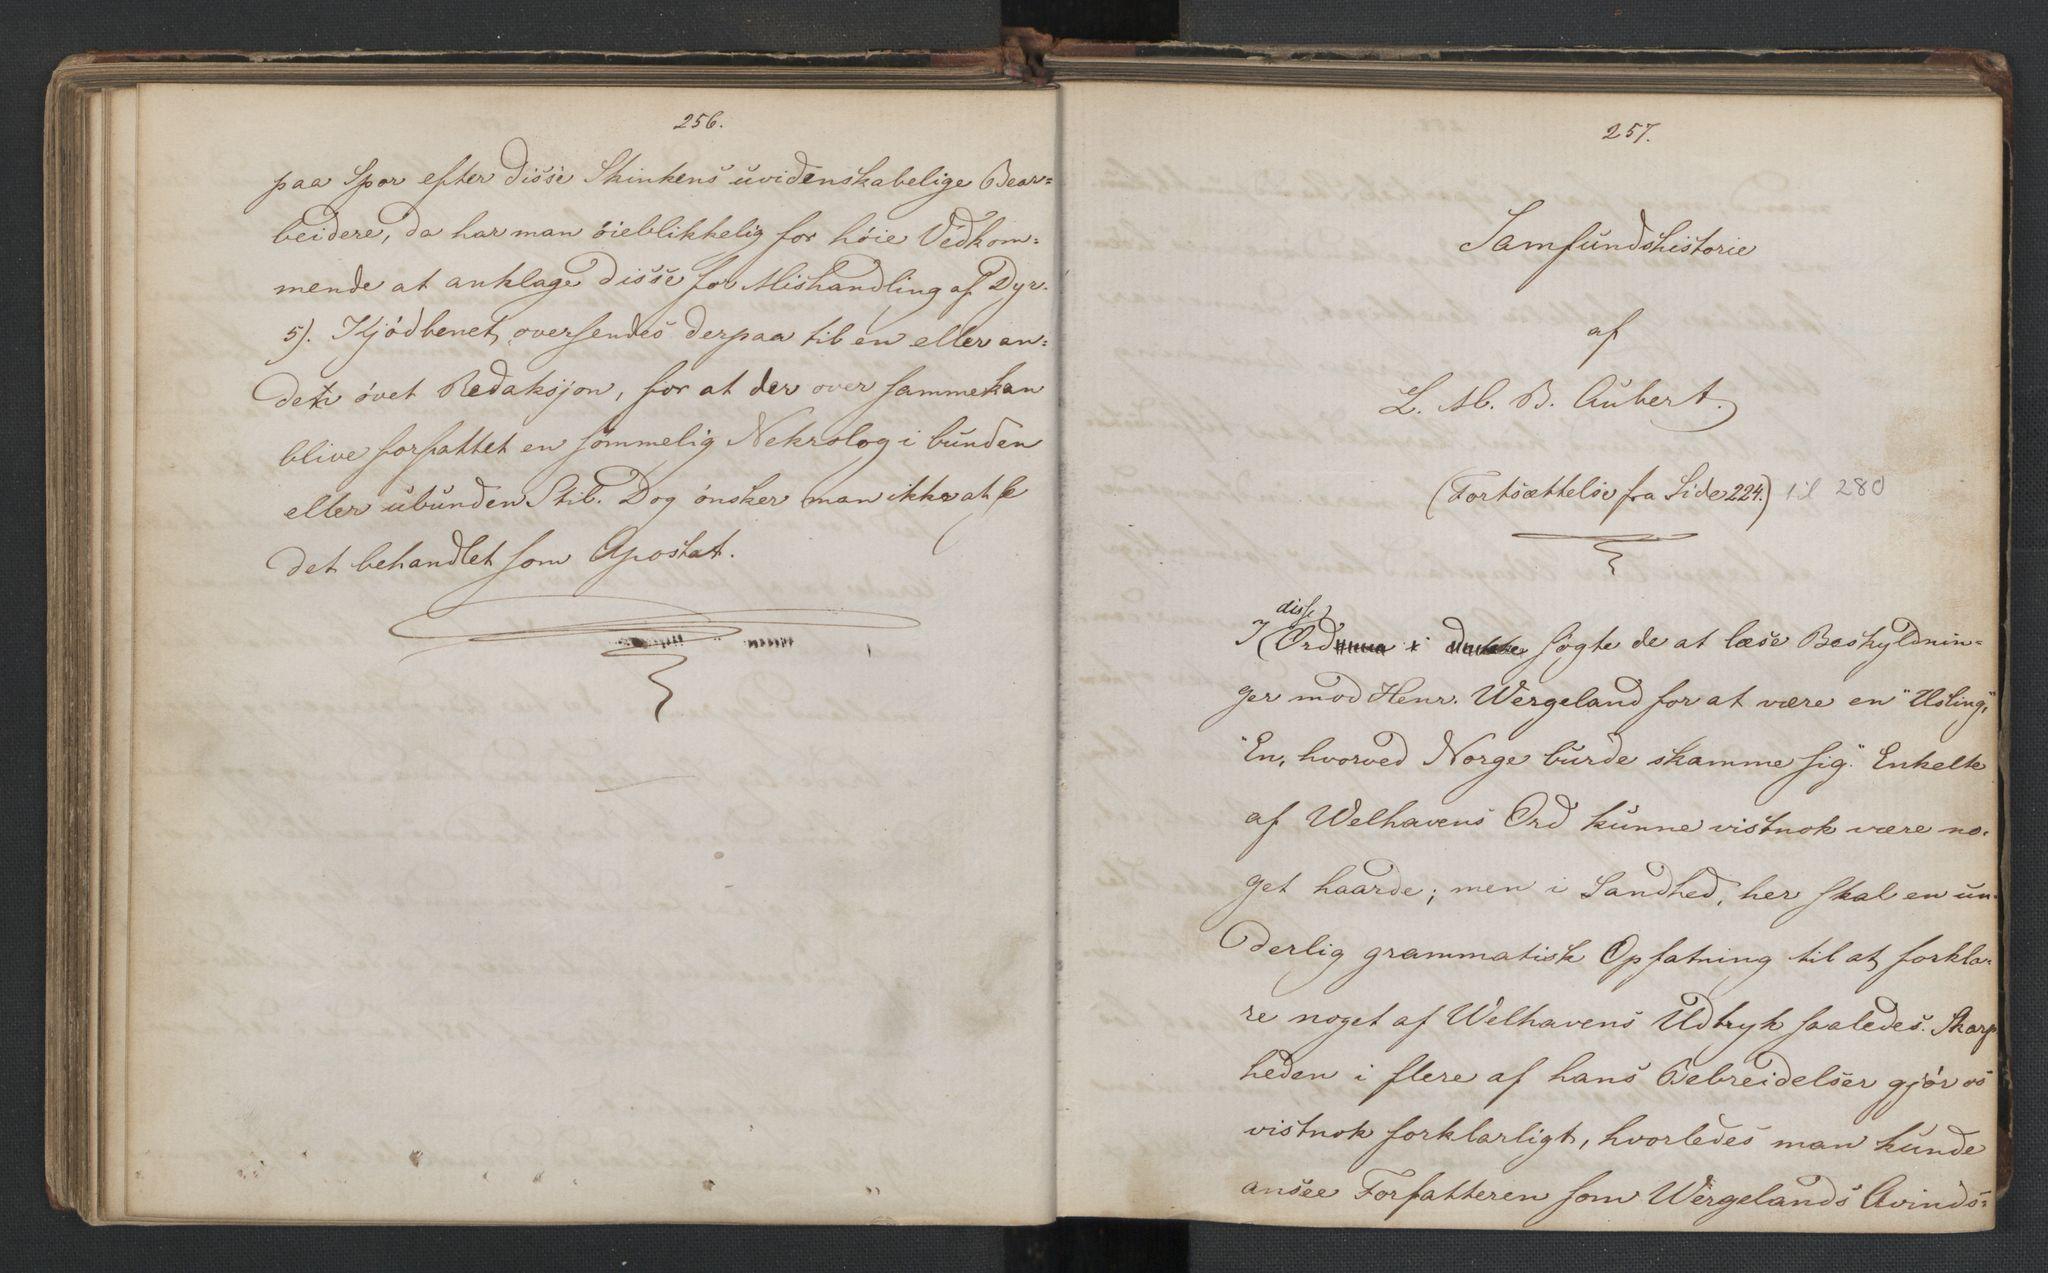 RA, Det Norske Studentersamfund, X/Xa/L0006, 1856-1857, s. 132